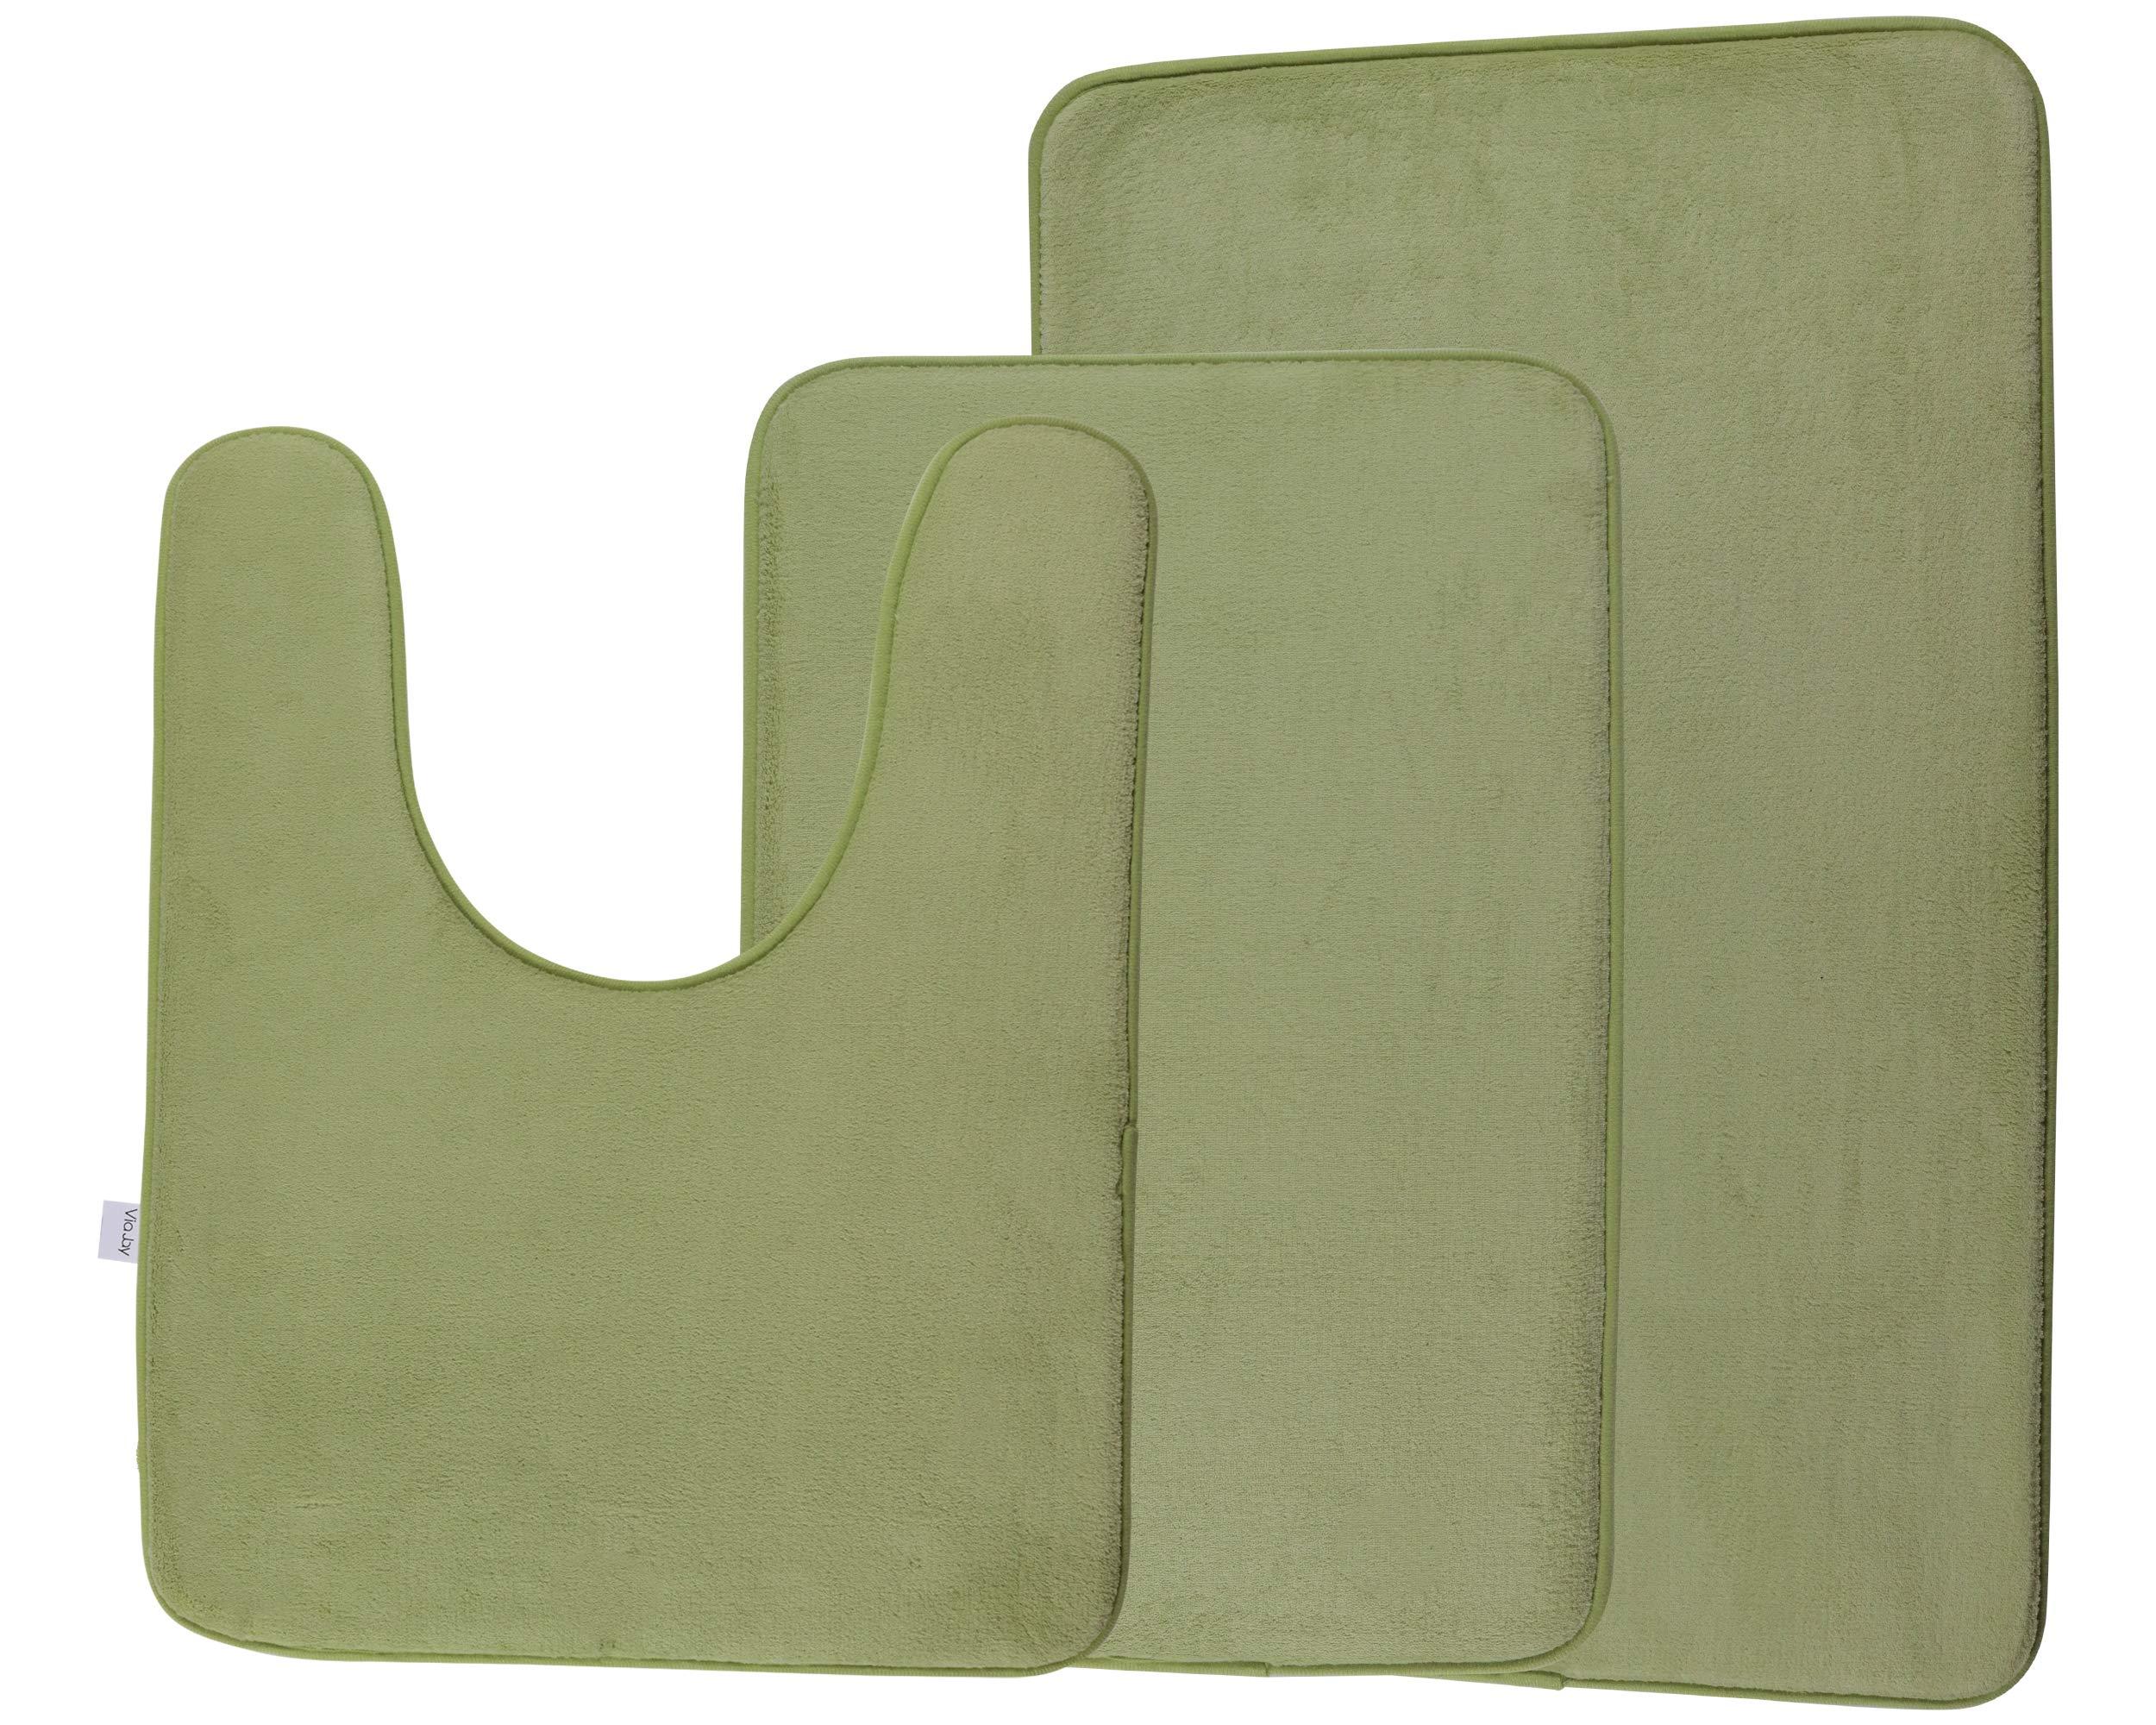 Via Jay Non Slip Memory Foam Bathroom Mat Rug 3 Pack Set, Includes 1 Small (16'' x 24''), 1 Large (20'' x 32''), 1 Contour Mat (20'' x 24'') - Sage Green - Microfiber Absorbent Soft, Shower